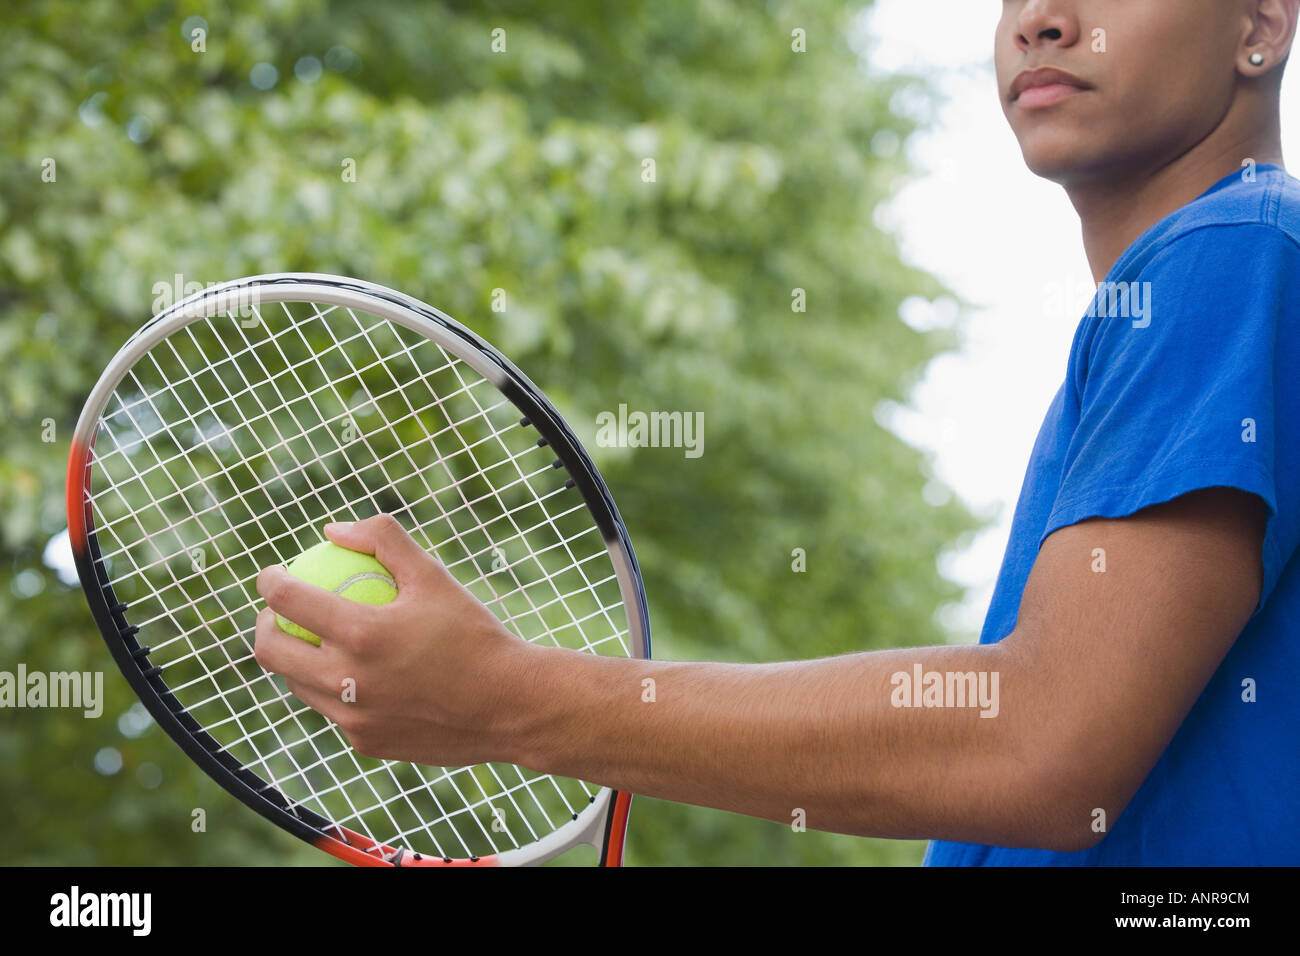 Tennis Equipment Stock Photos & Tennis Equipment Stock ...